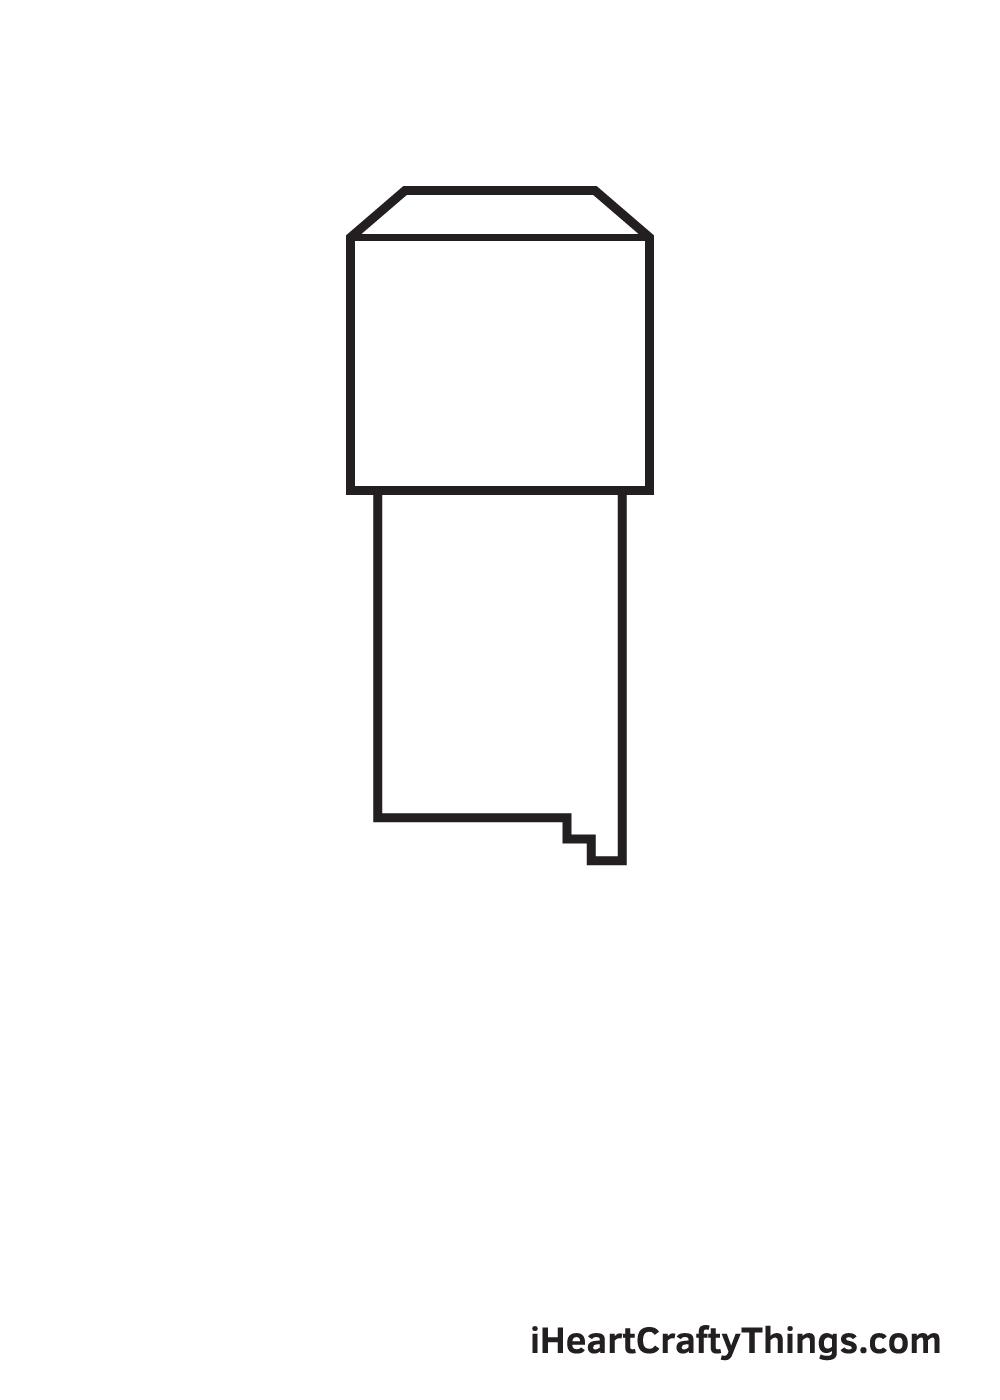 minecraft drawing step 2